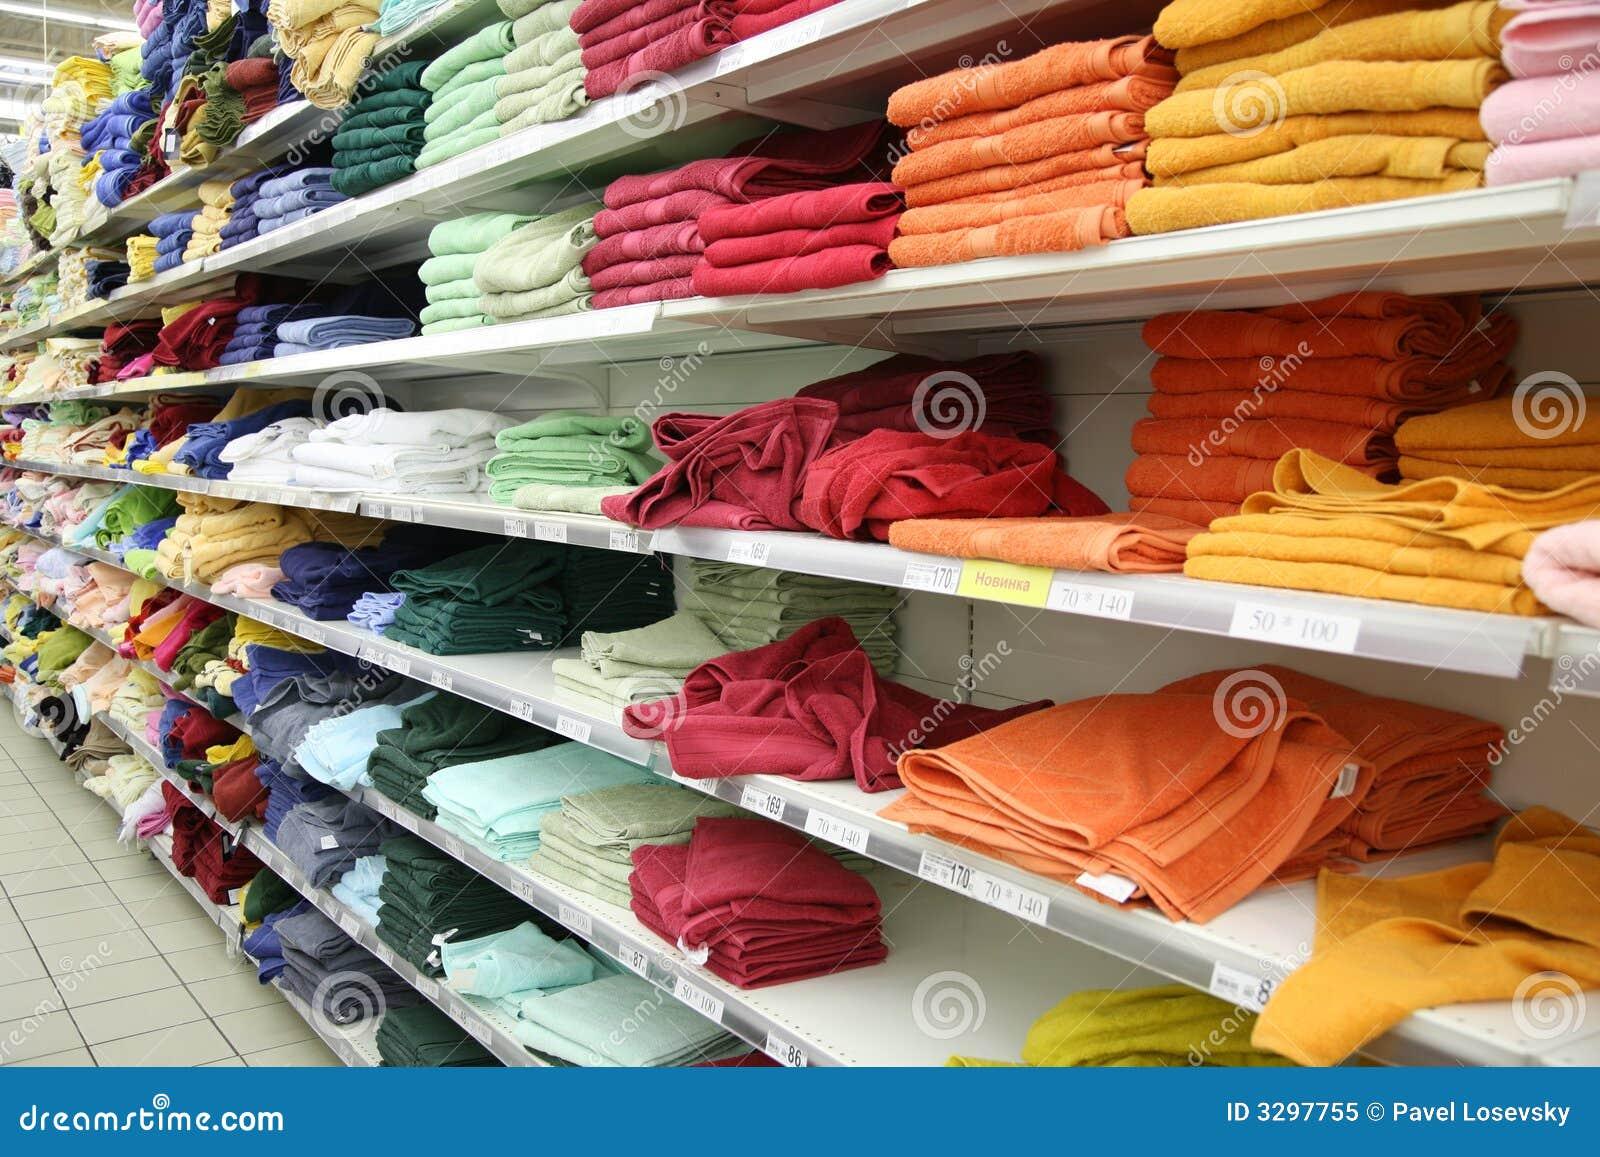 Towels in shop stock image. Image of shelf, gift, market ...